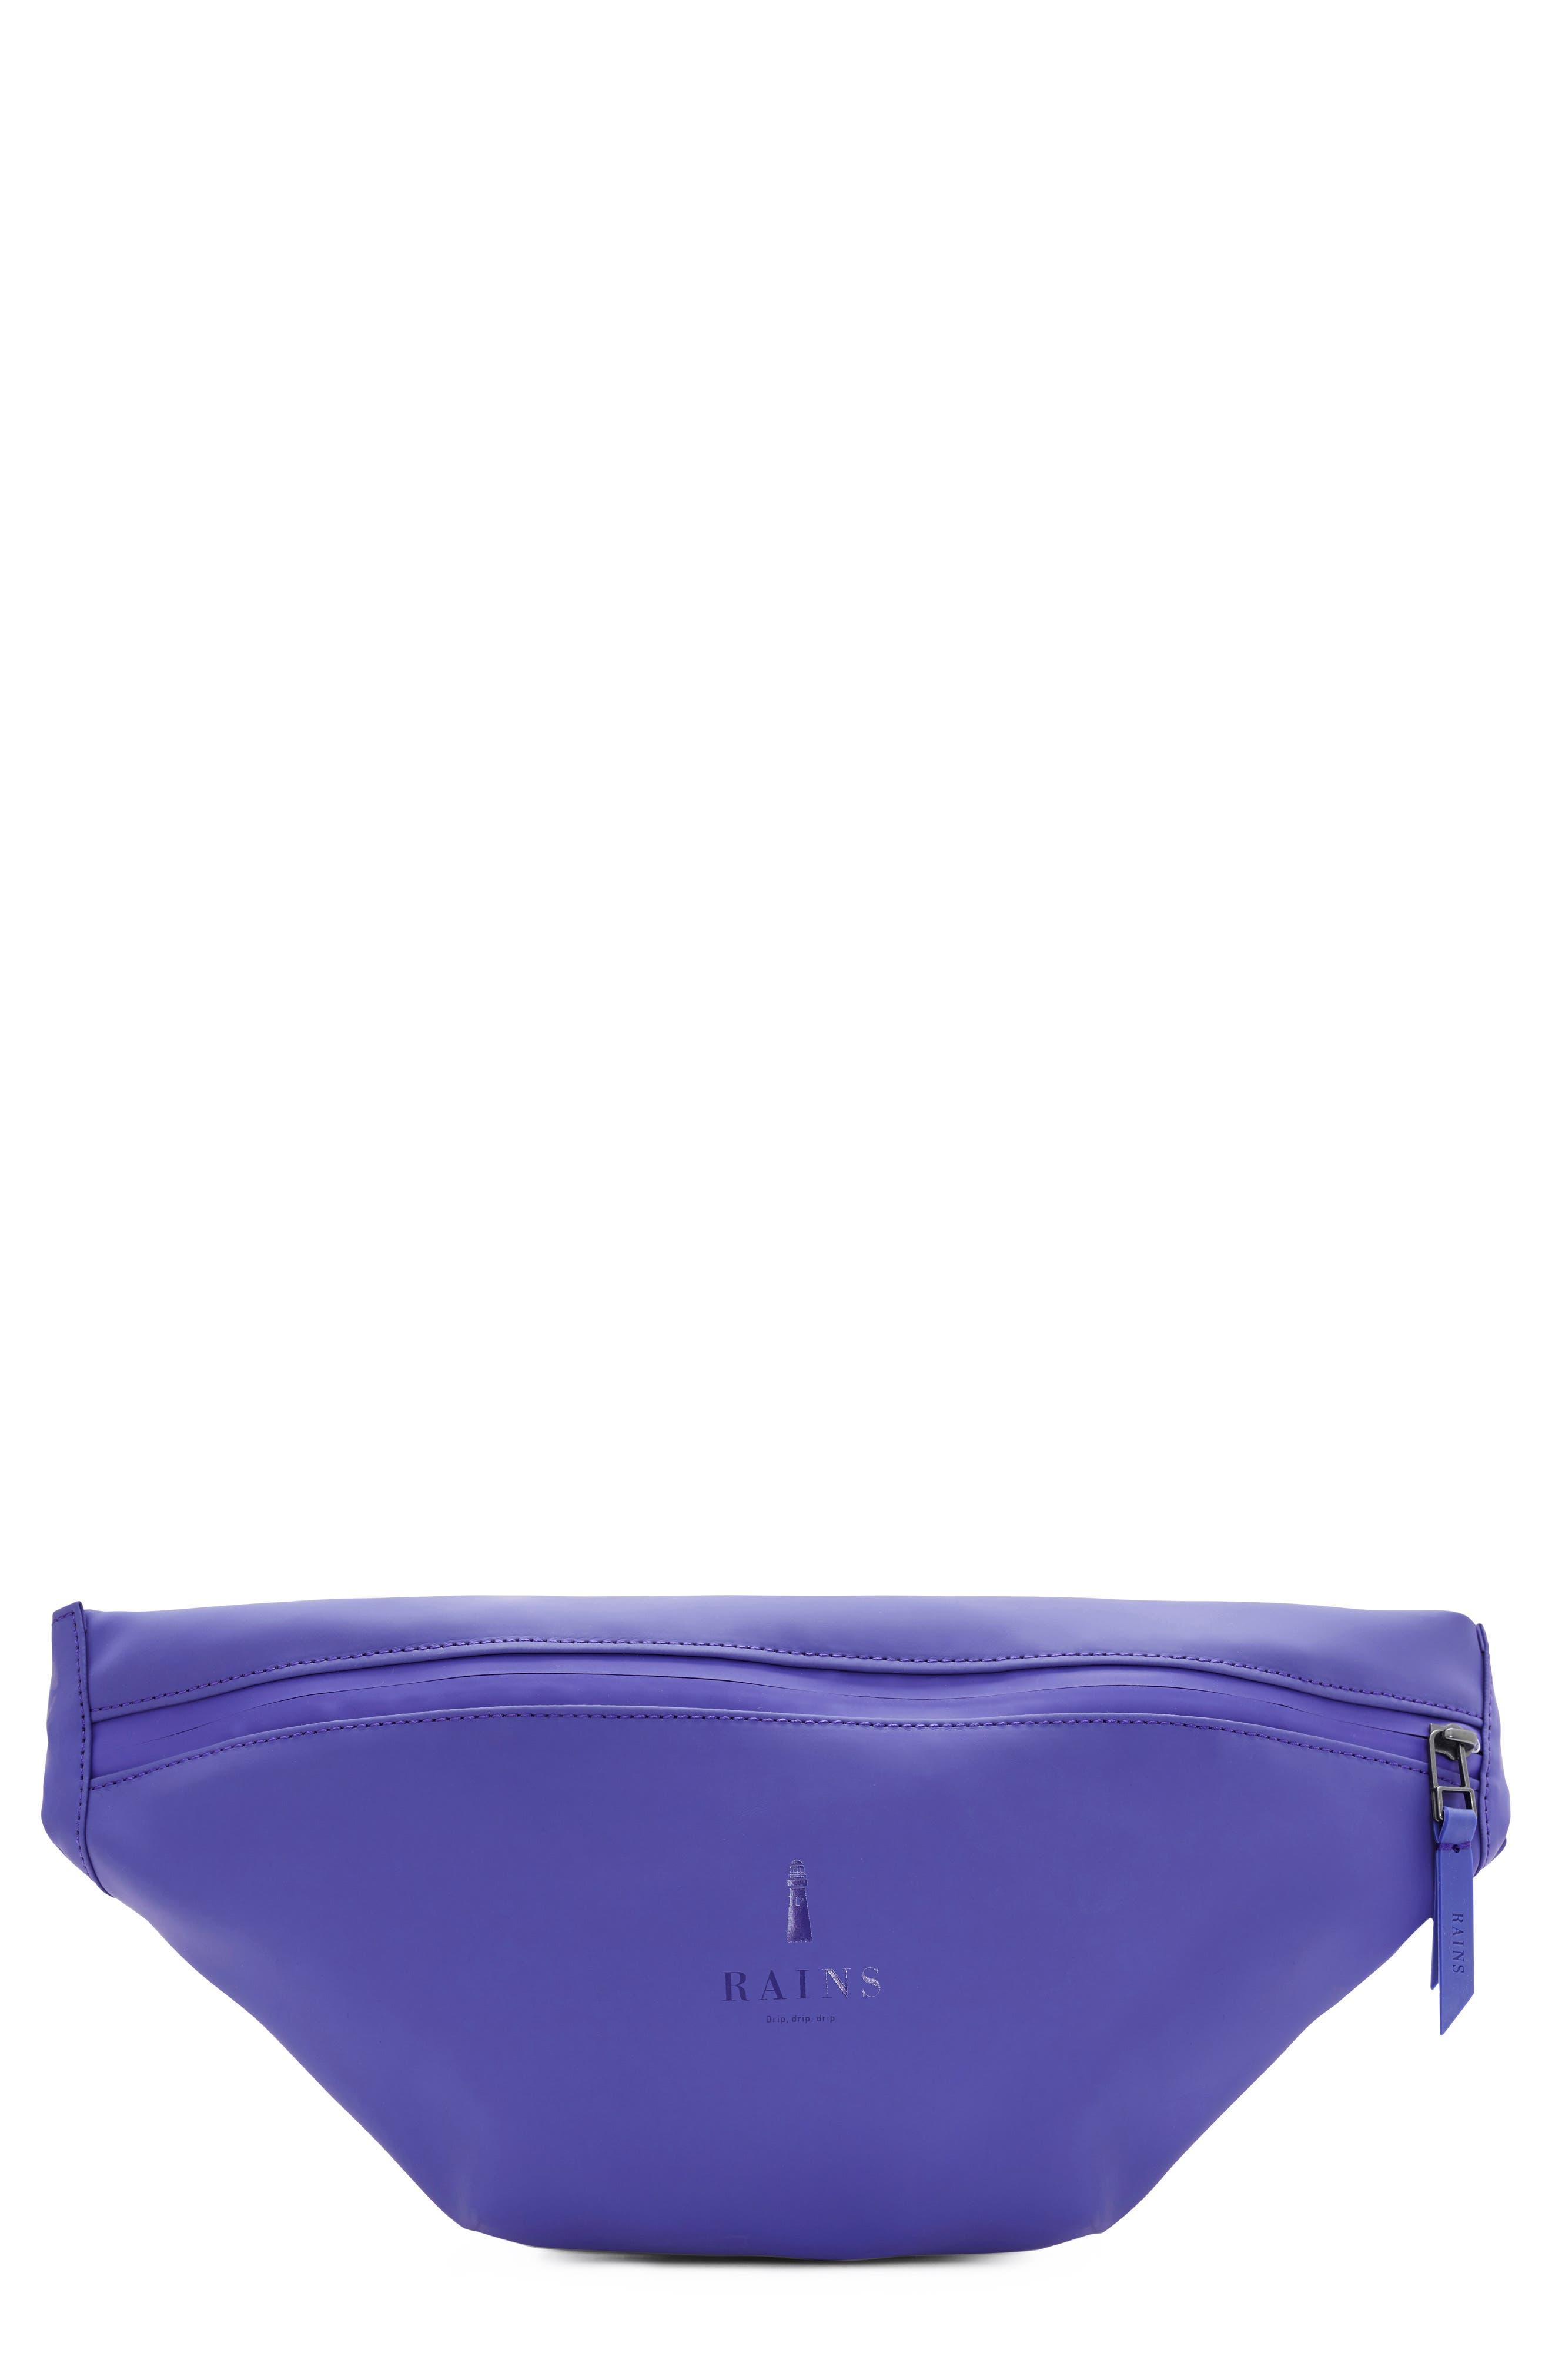 RAINS Belt Bag, Main, color, LILAC